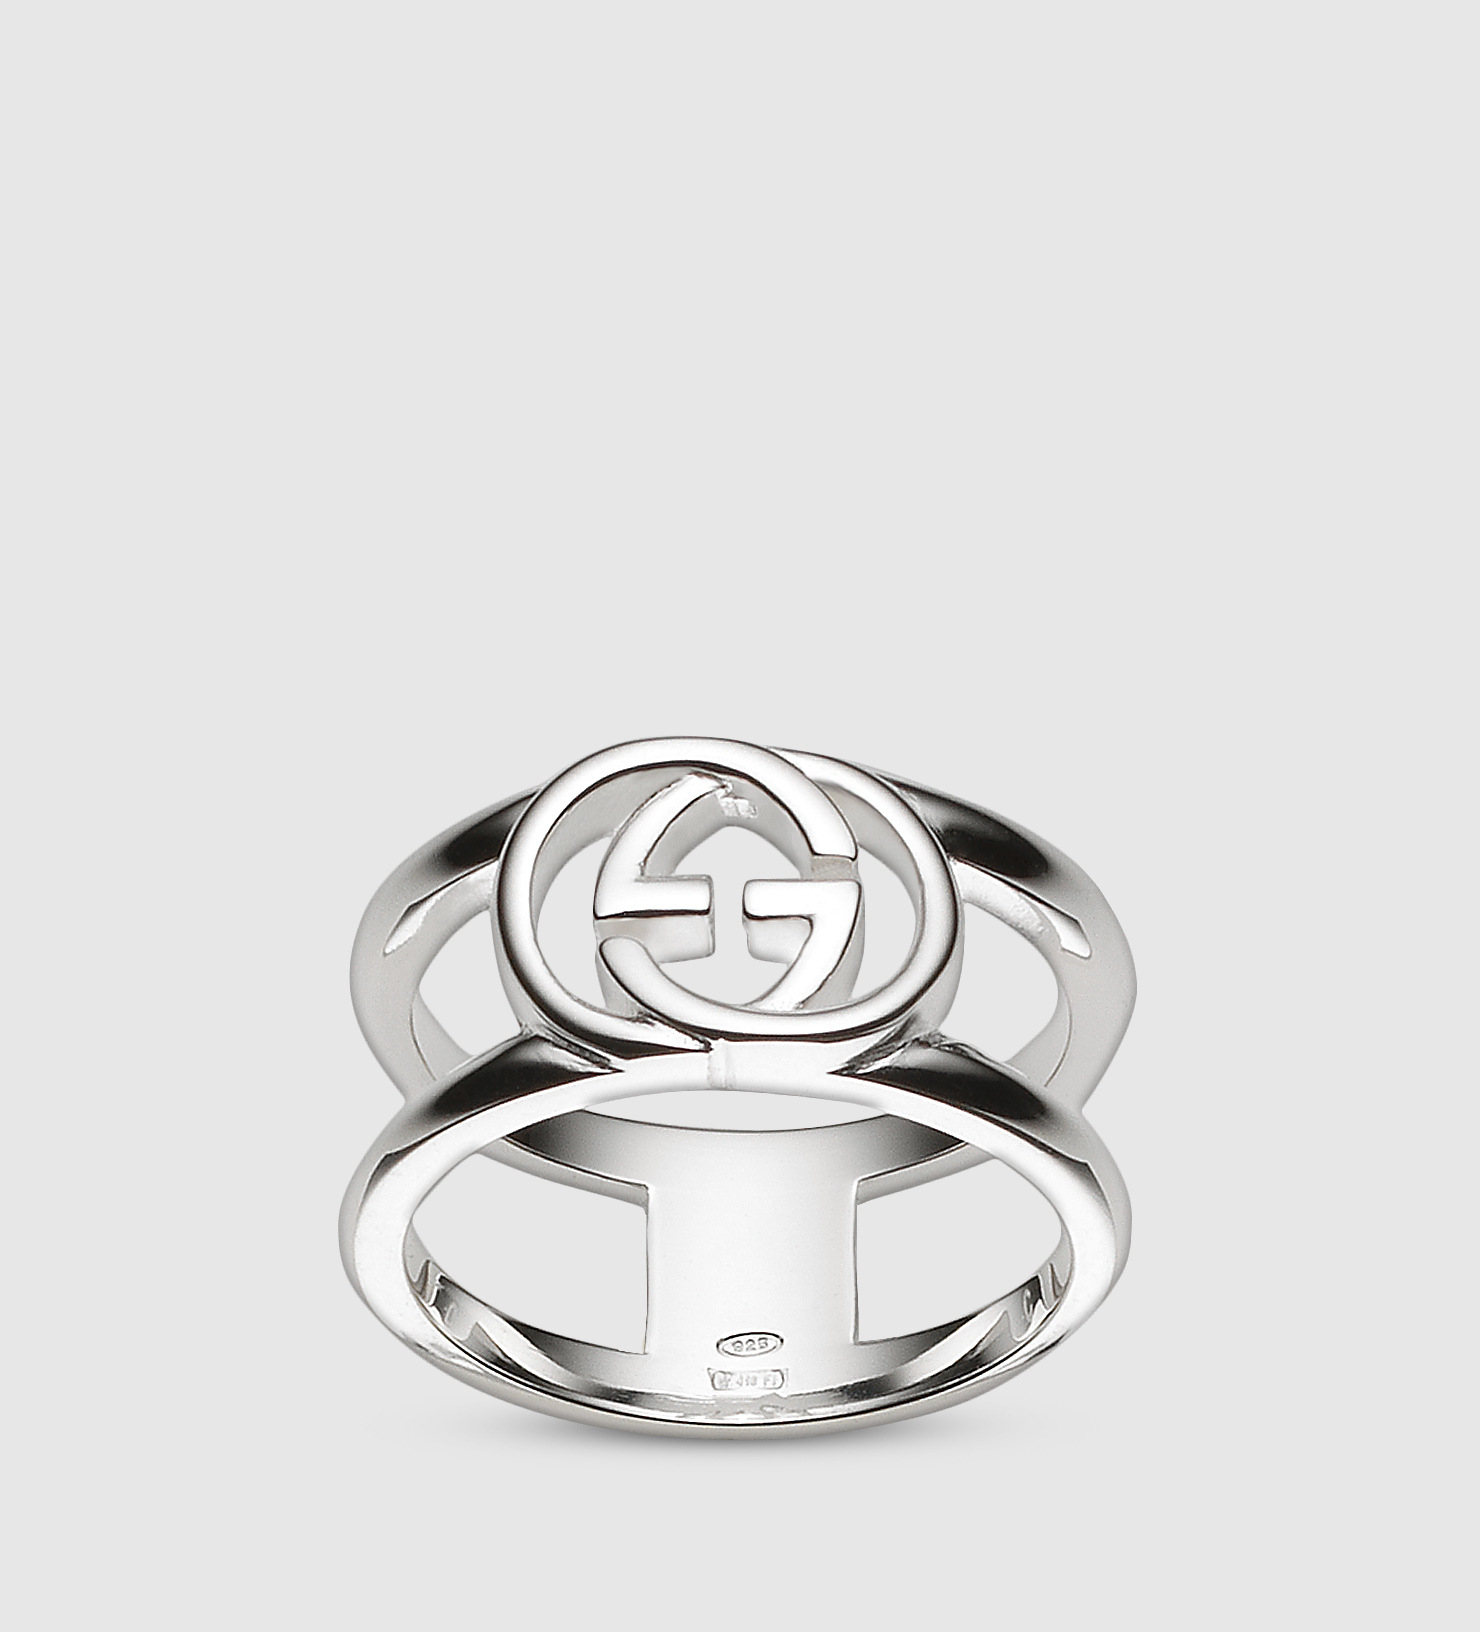 f2de4fbbc Gucci Wide Ring With Interlocking G Motif in Metallic - Lyst